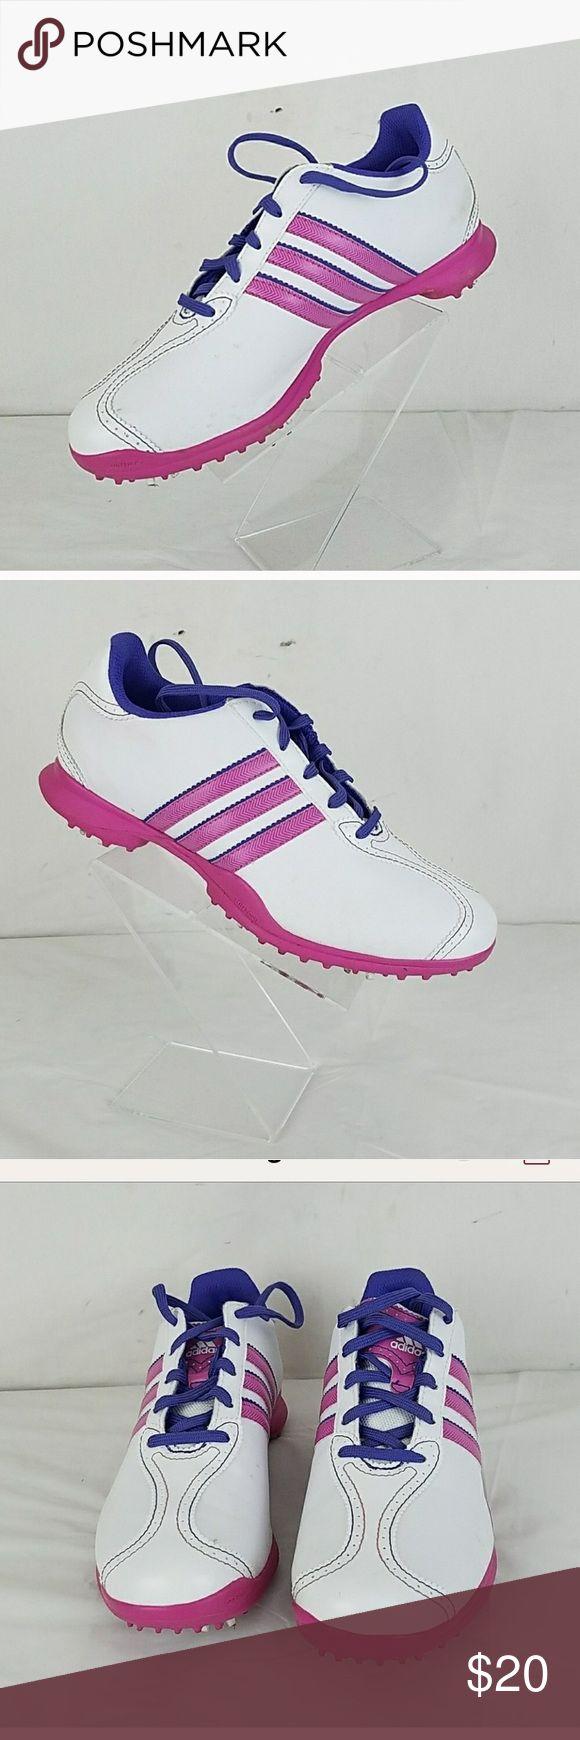 Adidas Golf Shoes Adidas Golf shoes size 8.5 adidas Shoes Athletic Shoes